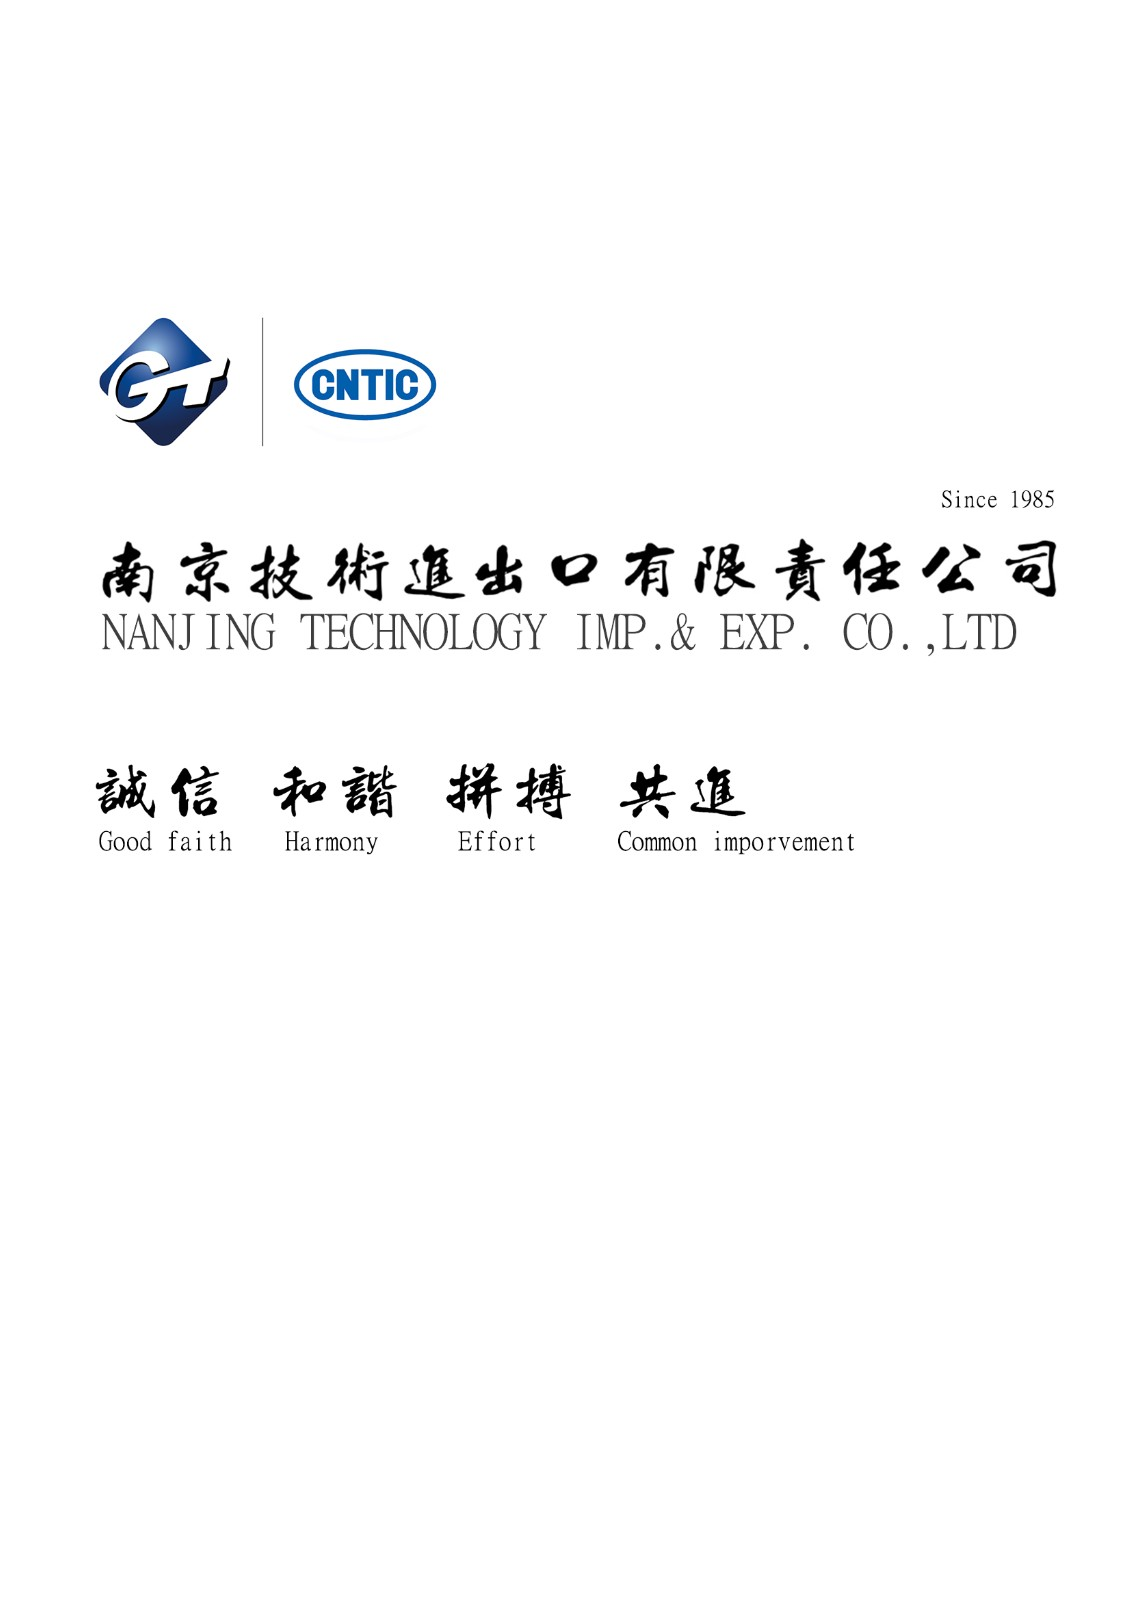 NANJING TECHNOLOGY IMPORT & EXPORT CO., LTD.